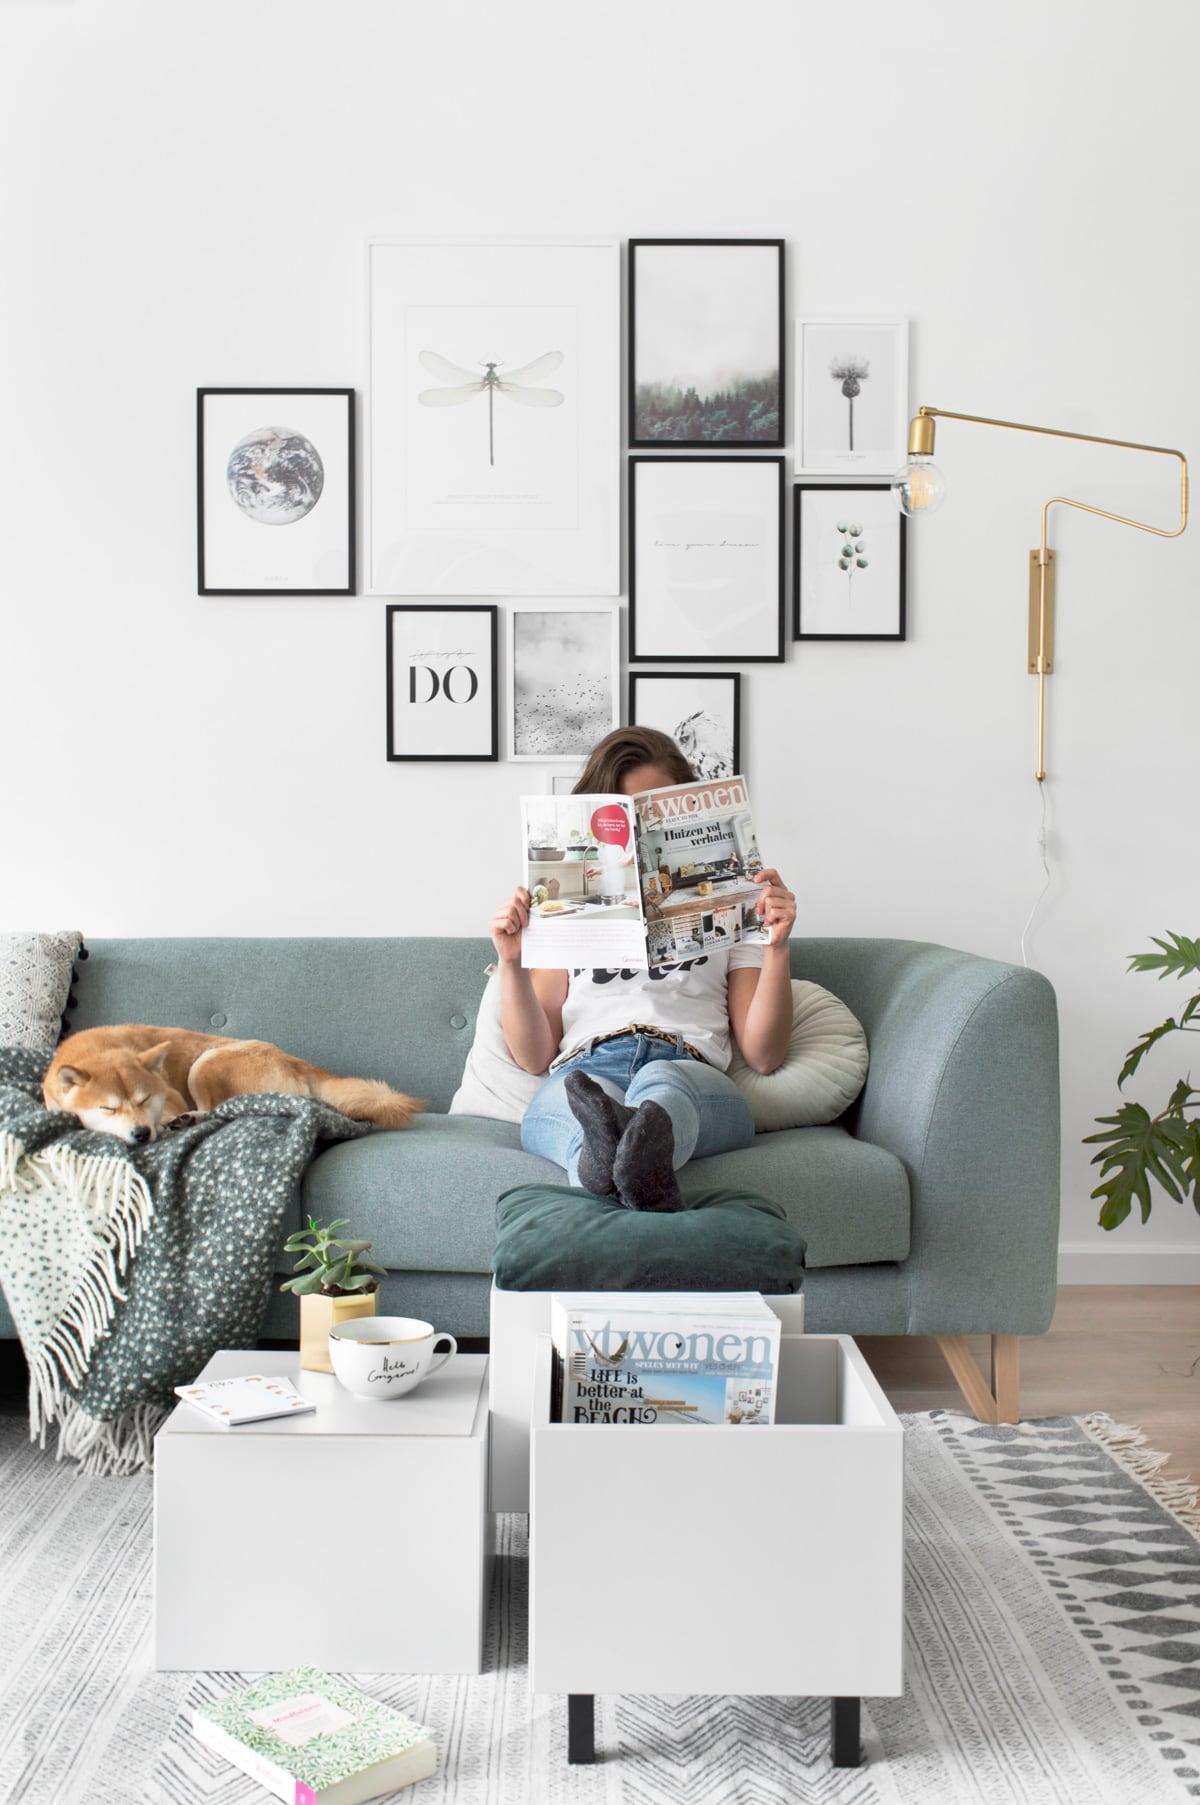 Multifunctionele salontafel IKEA hack - Tanja van Hoogdalem